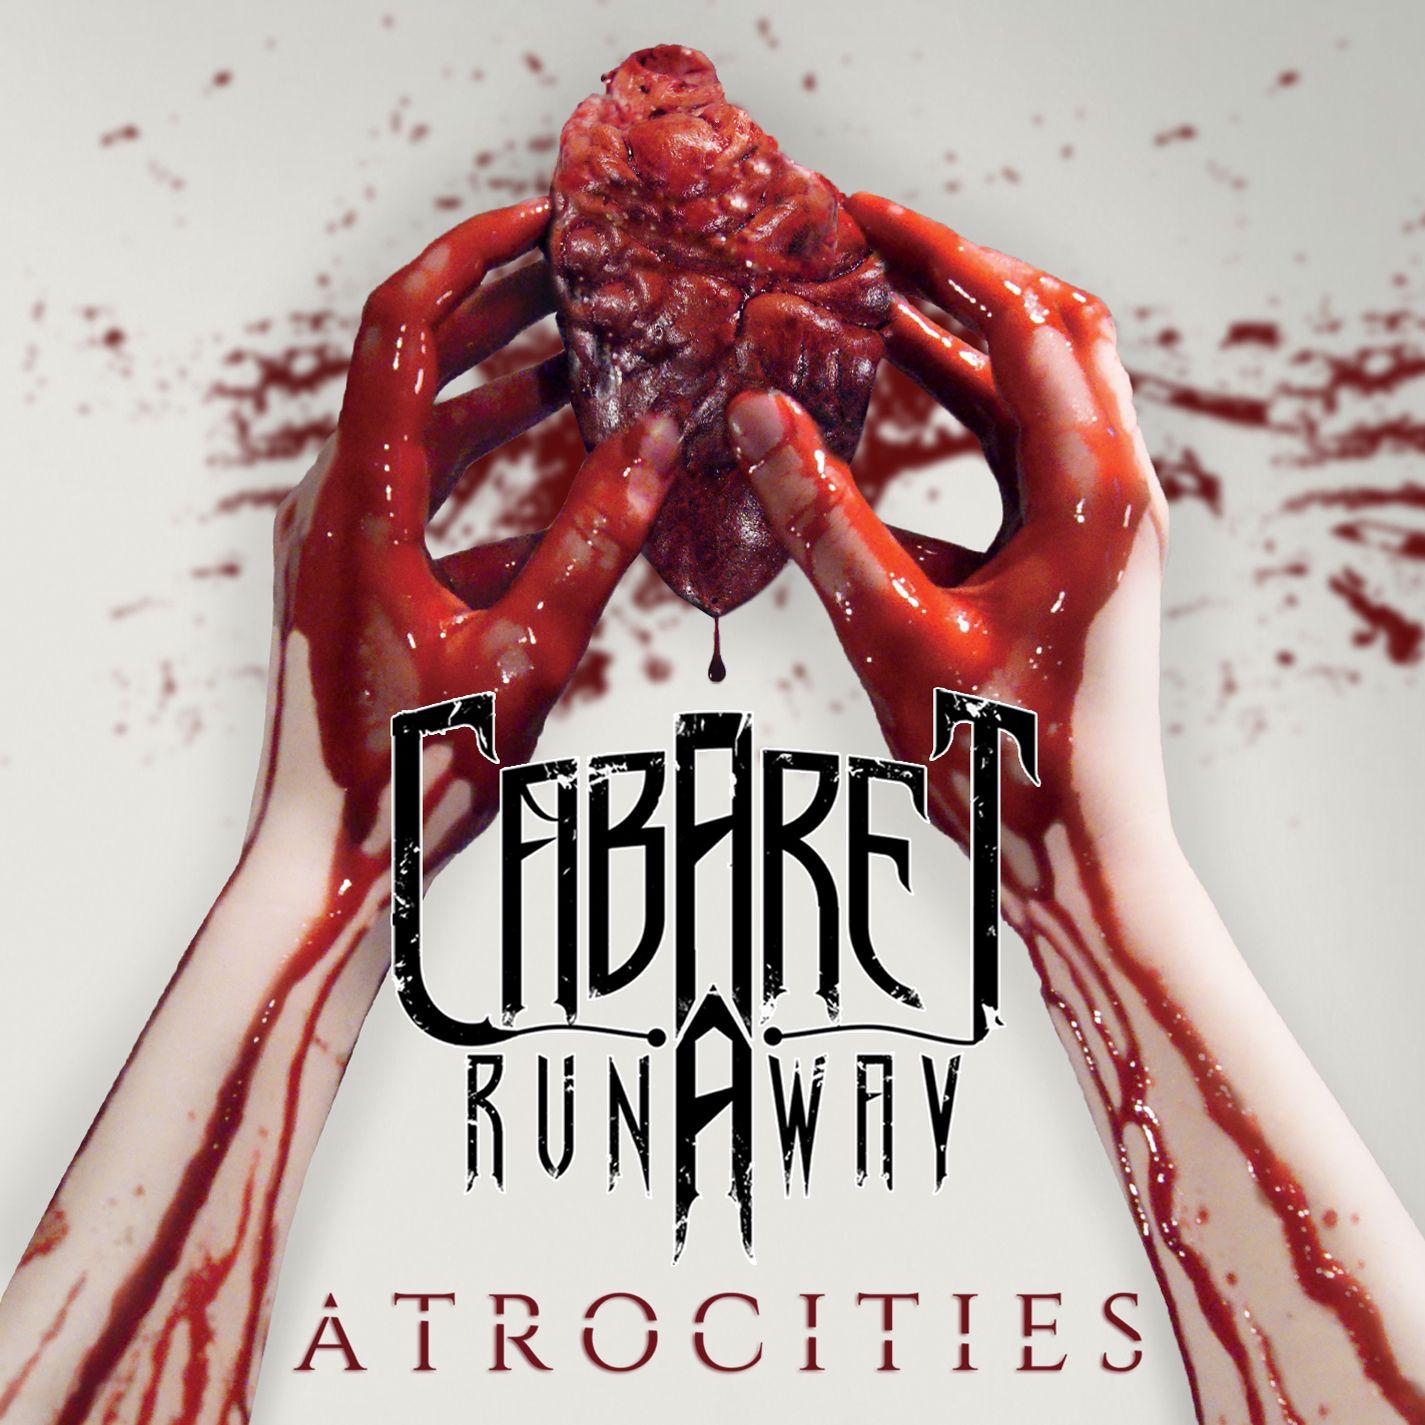 Cabaret Runaway - Atrocities (2015)